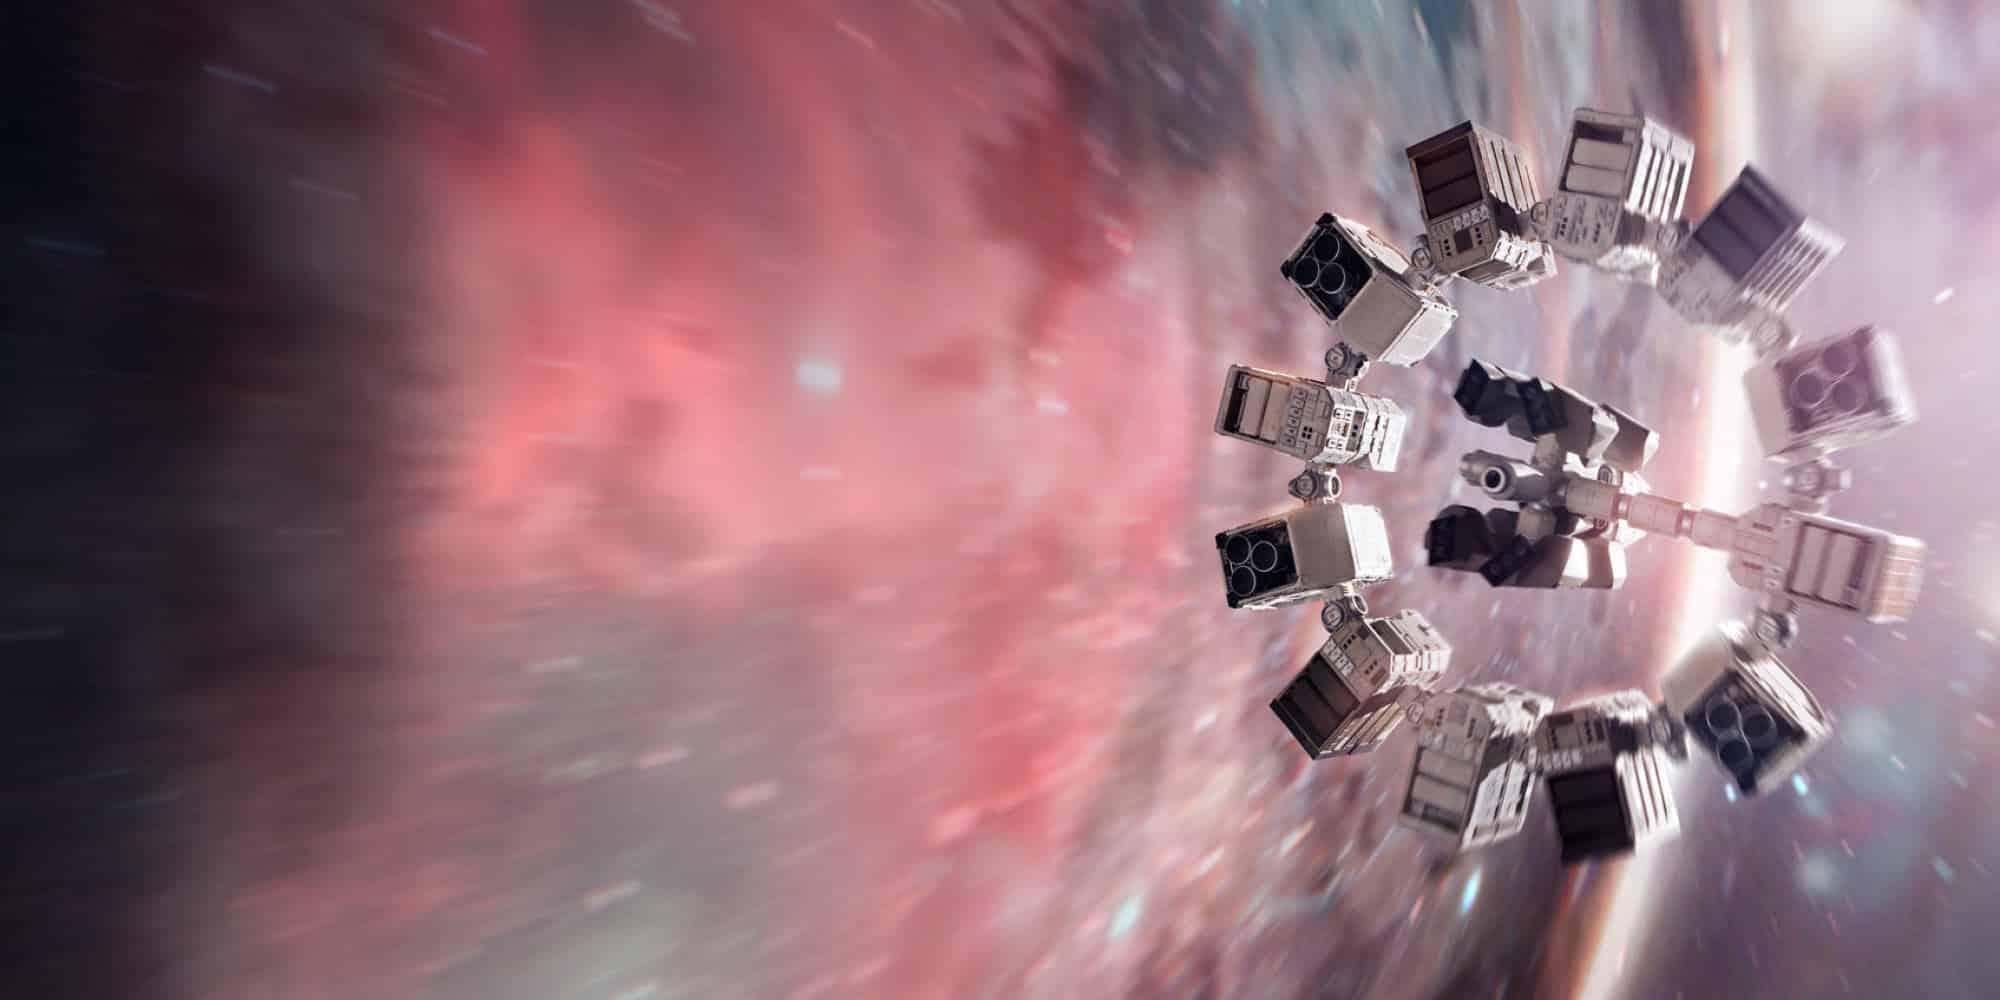 Space more Interstellar